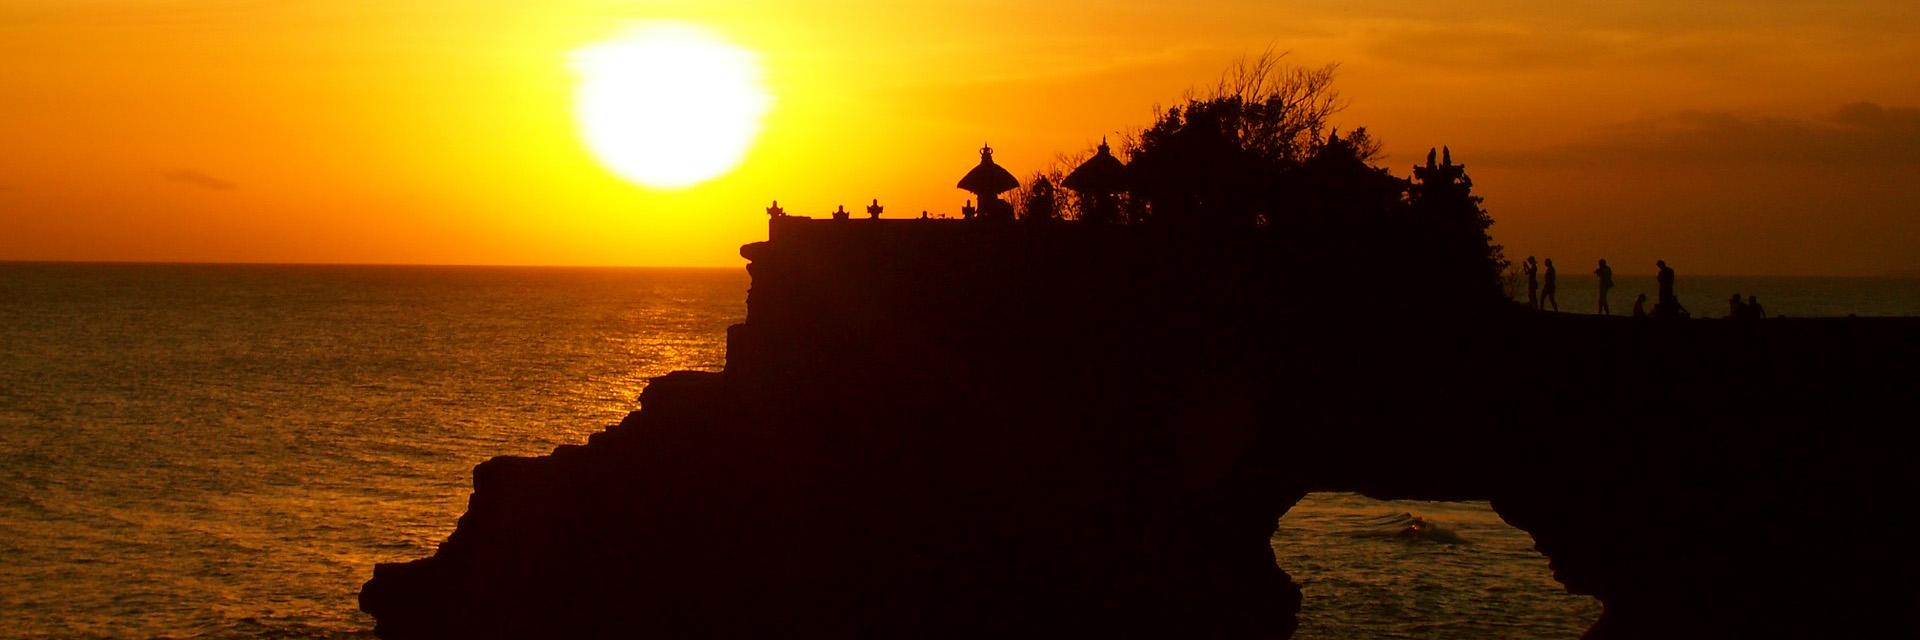 bali-temple-sunset